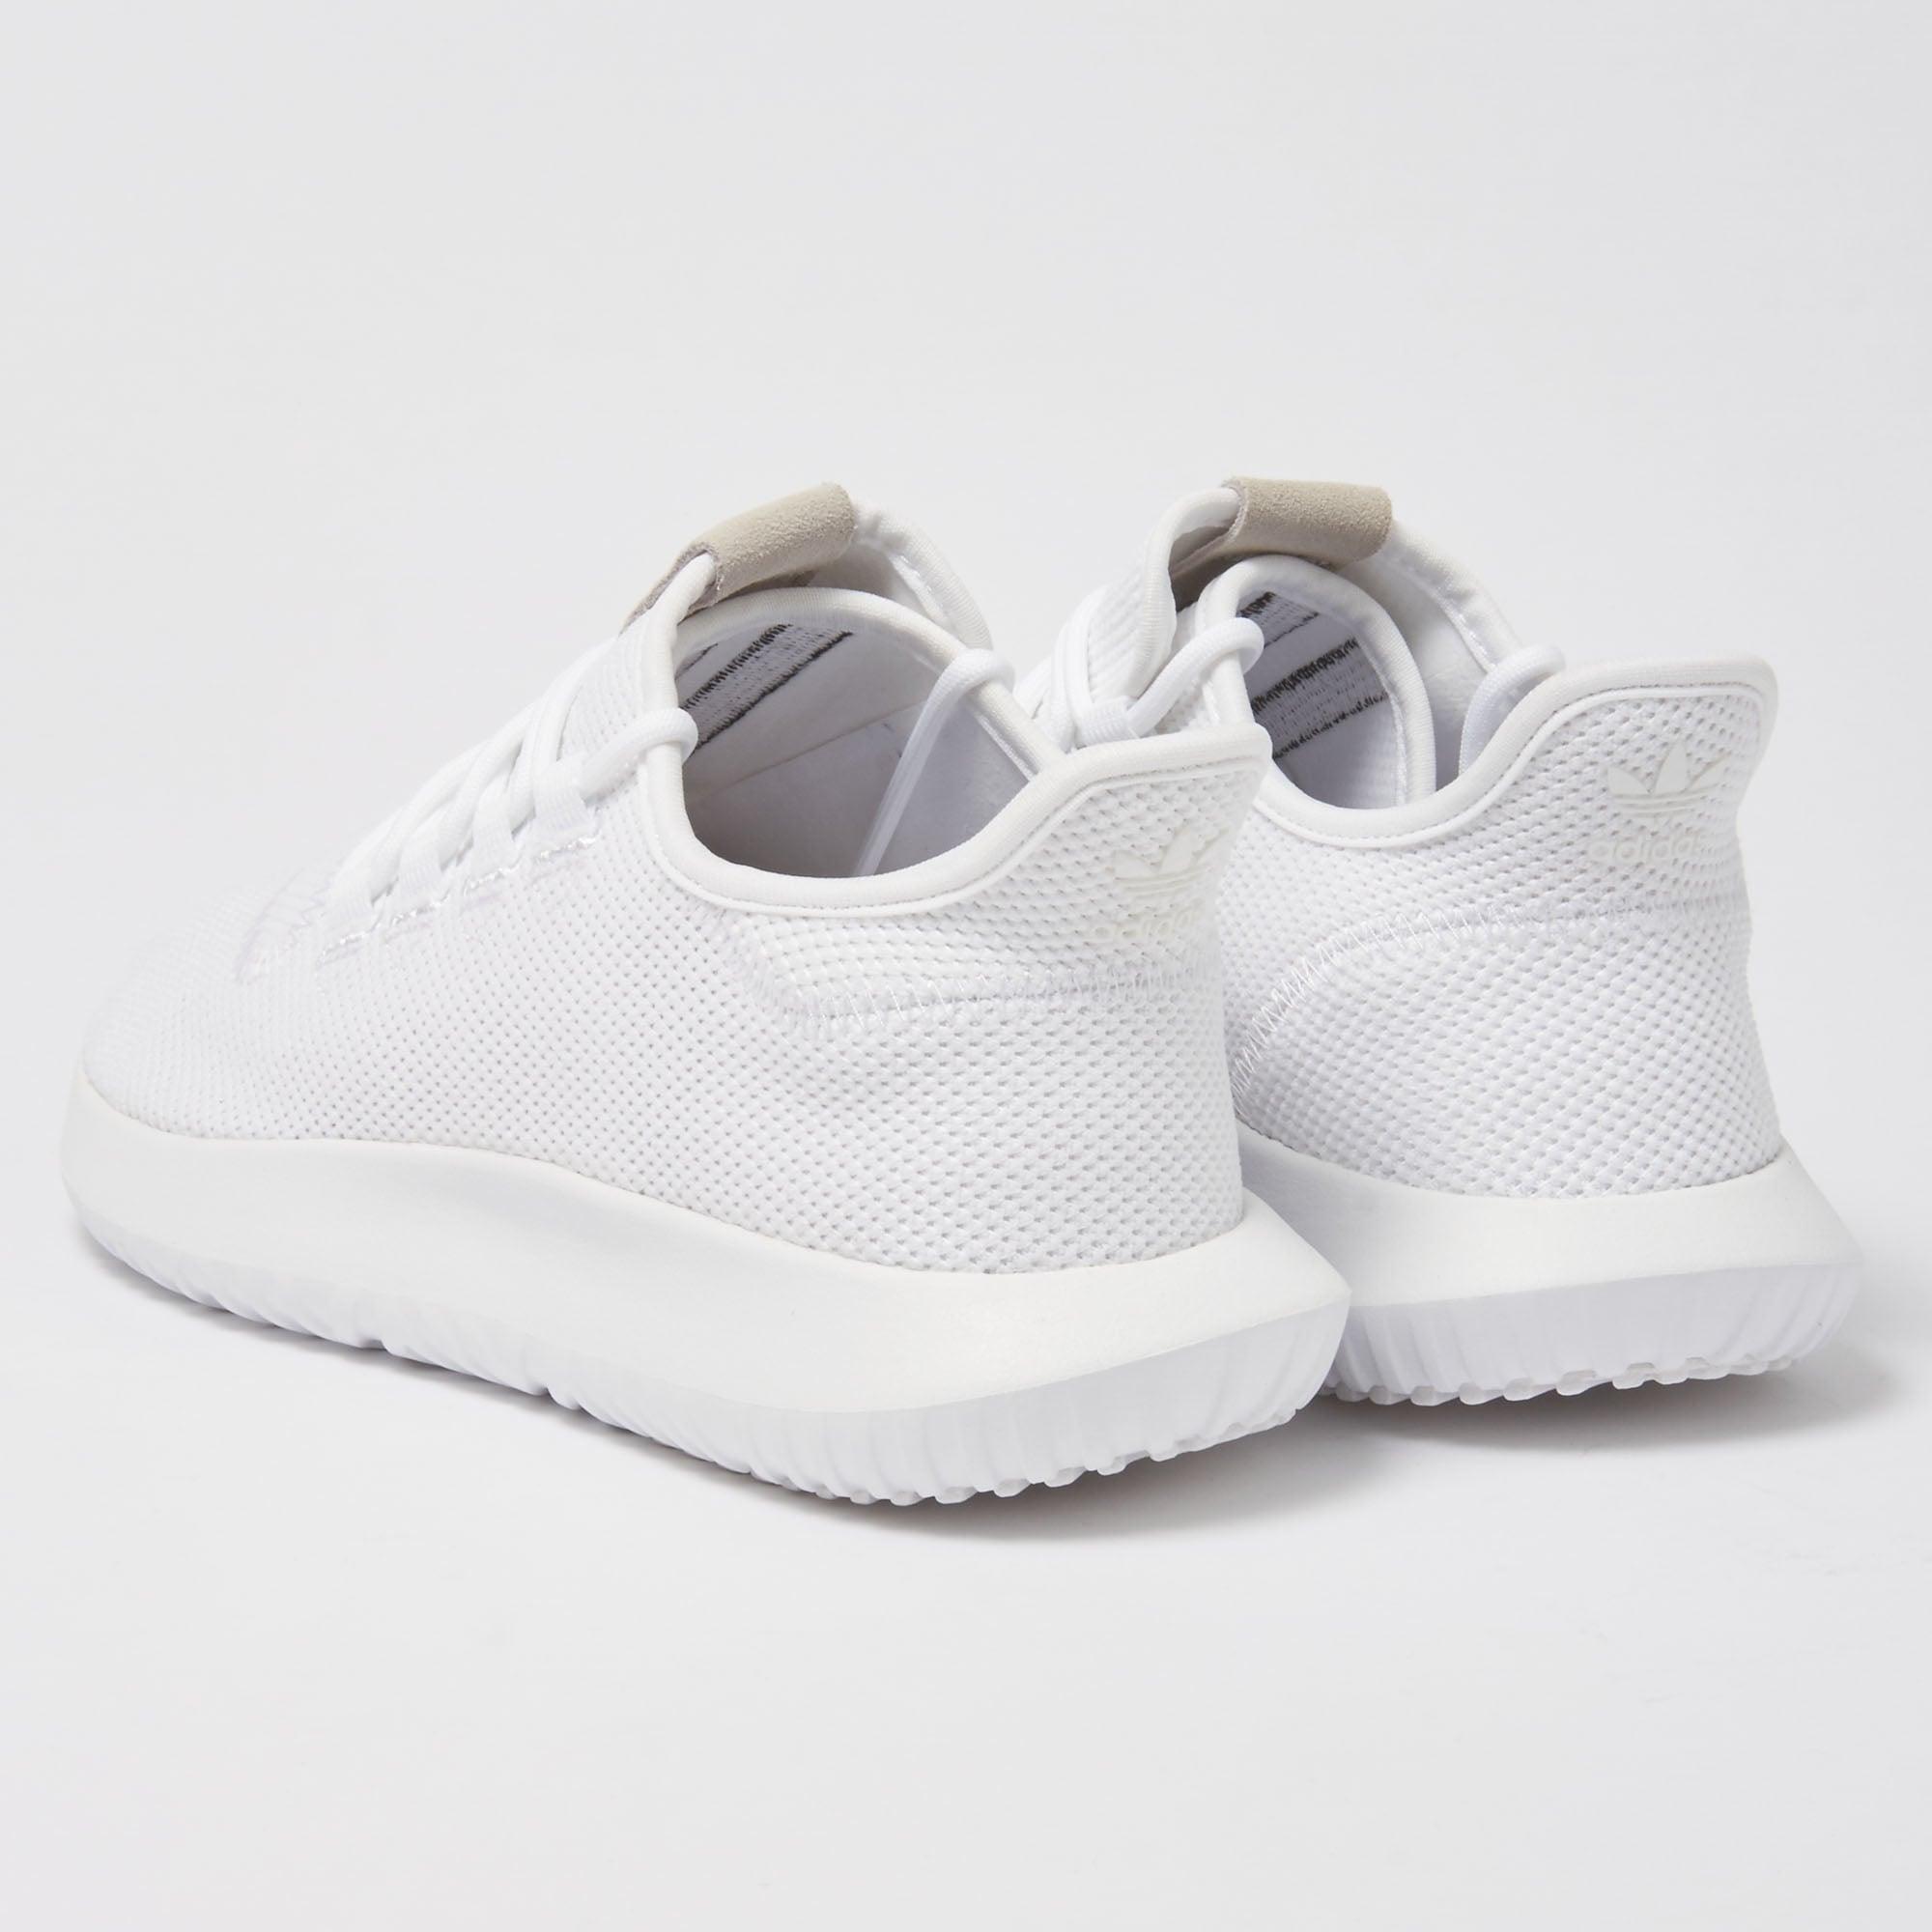 Adidas Originals Tubular Shadow CG4563  Tubular Shadow FTW White Shoes  CG4563